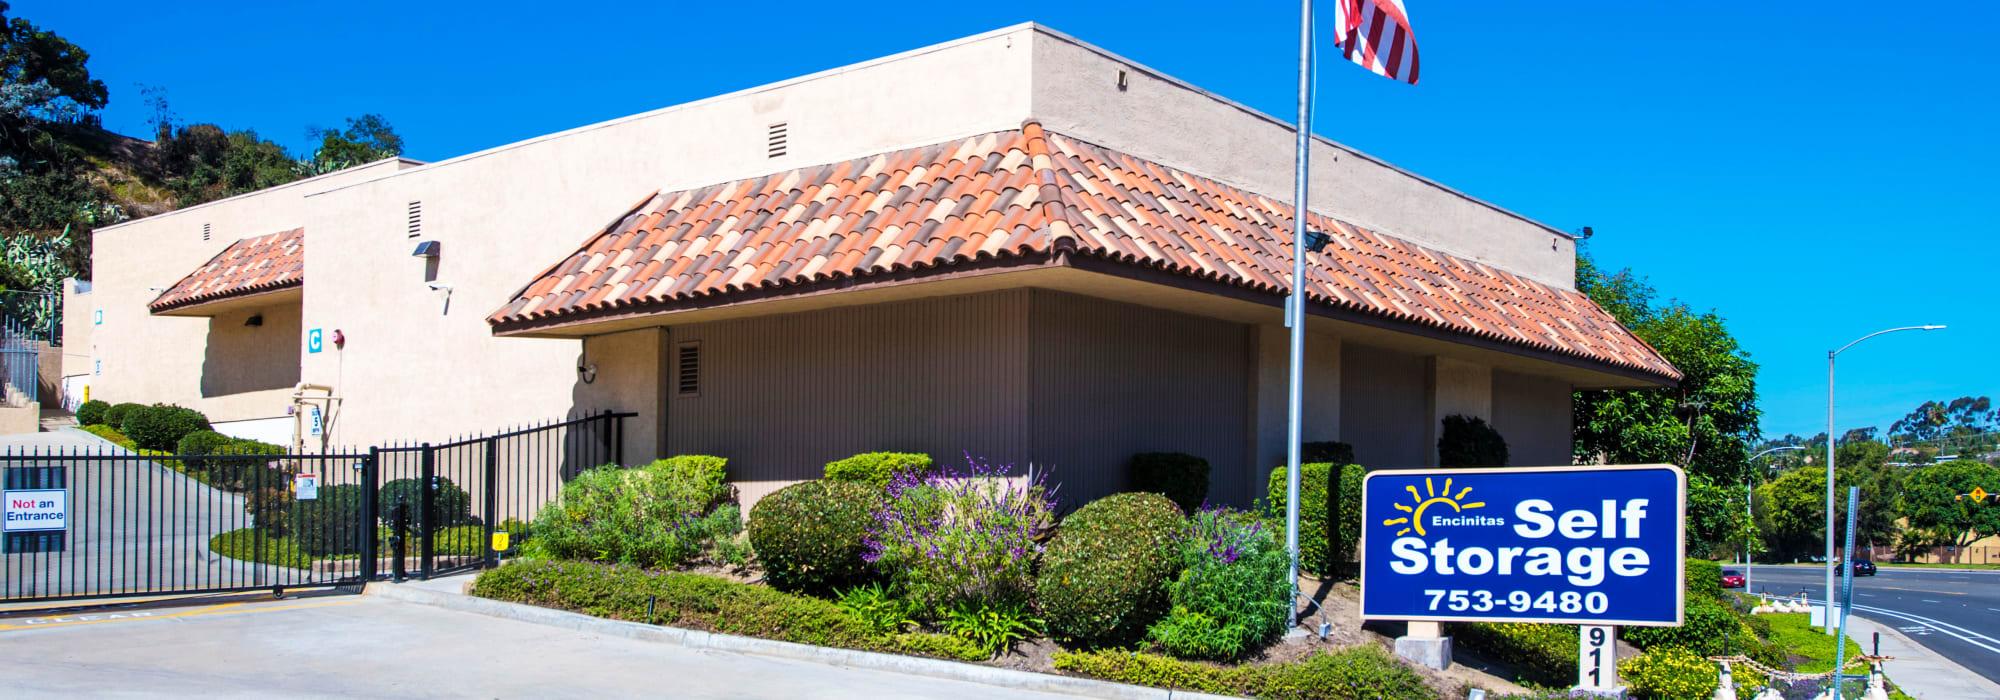 Branding on the exterior of Encinitas Self Storage in Encinitas, California